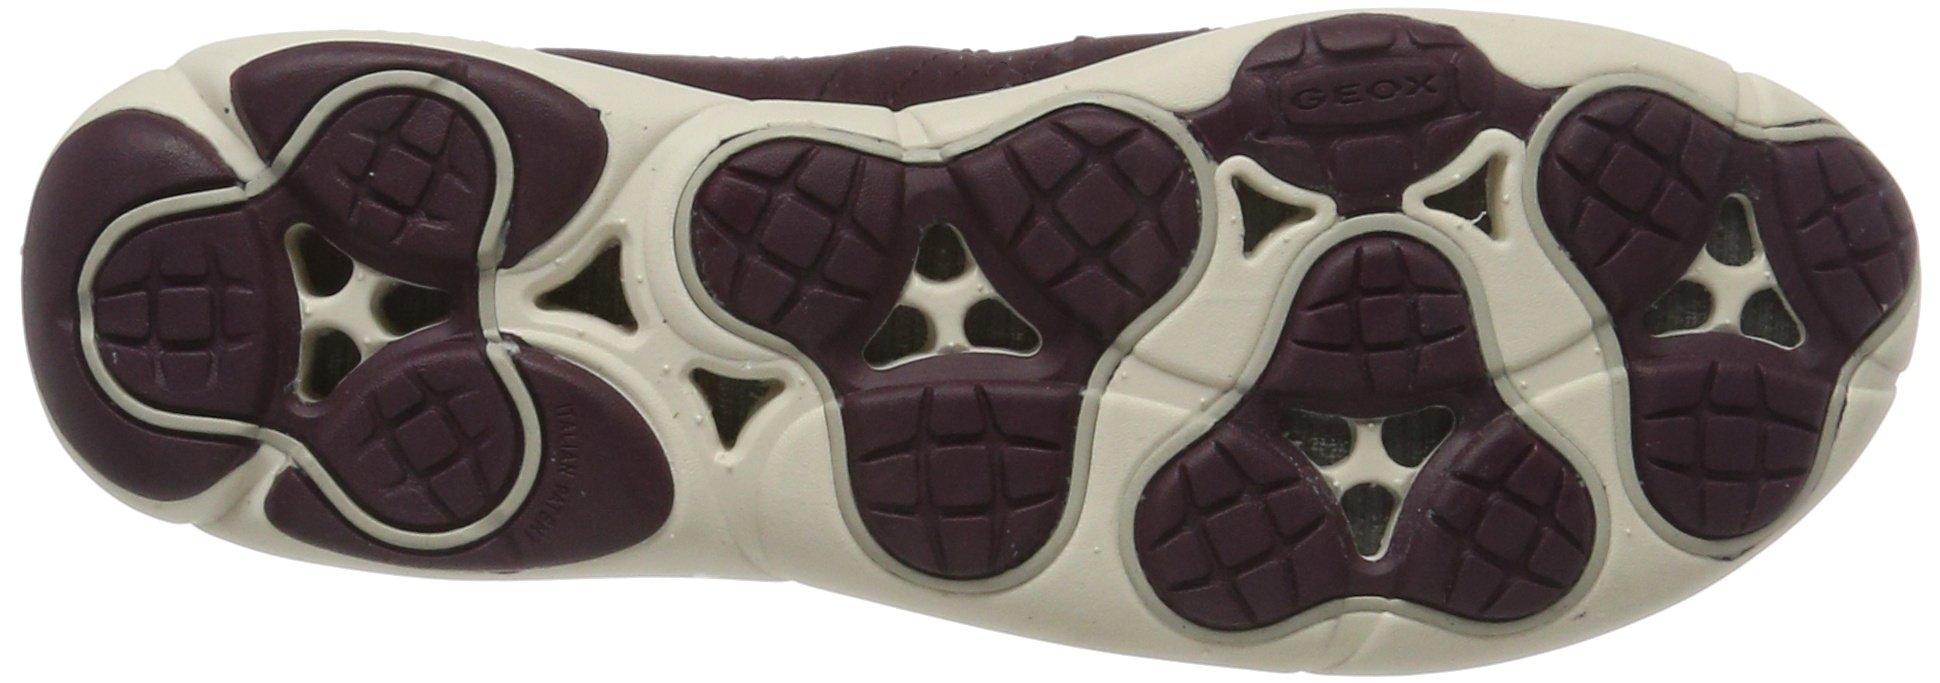 Geox Damen D Nebula A Low-Top Sneakers mit herausnehmender Ledersohle und atmungsaktiver Nebula-Technologie 3